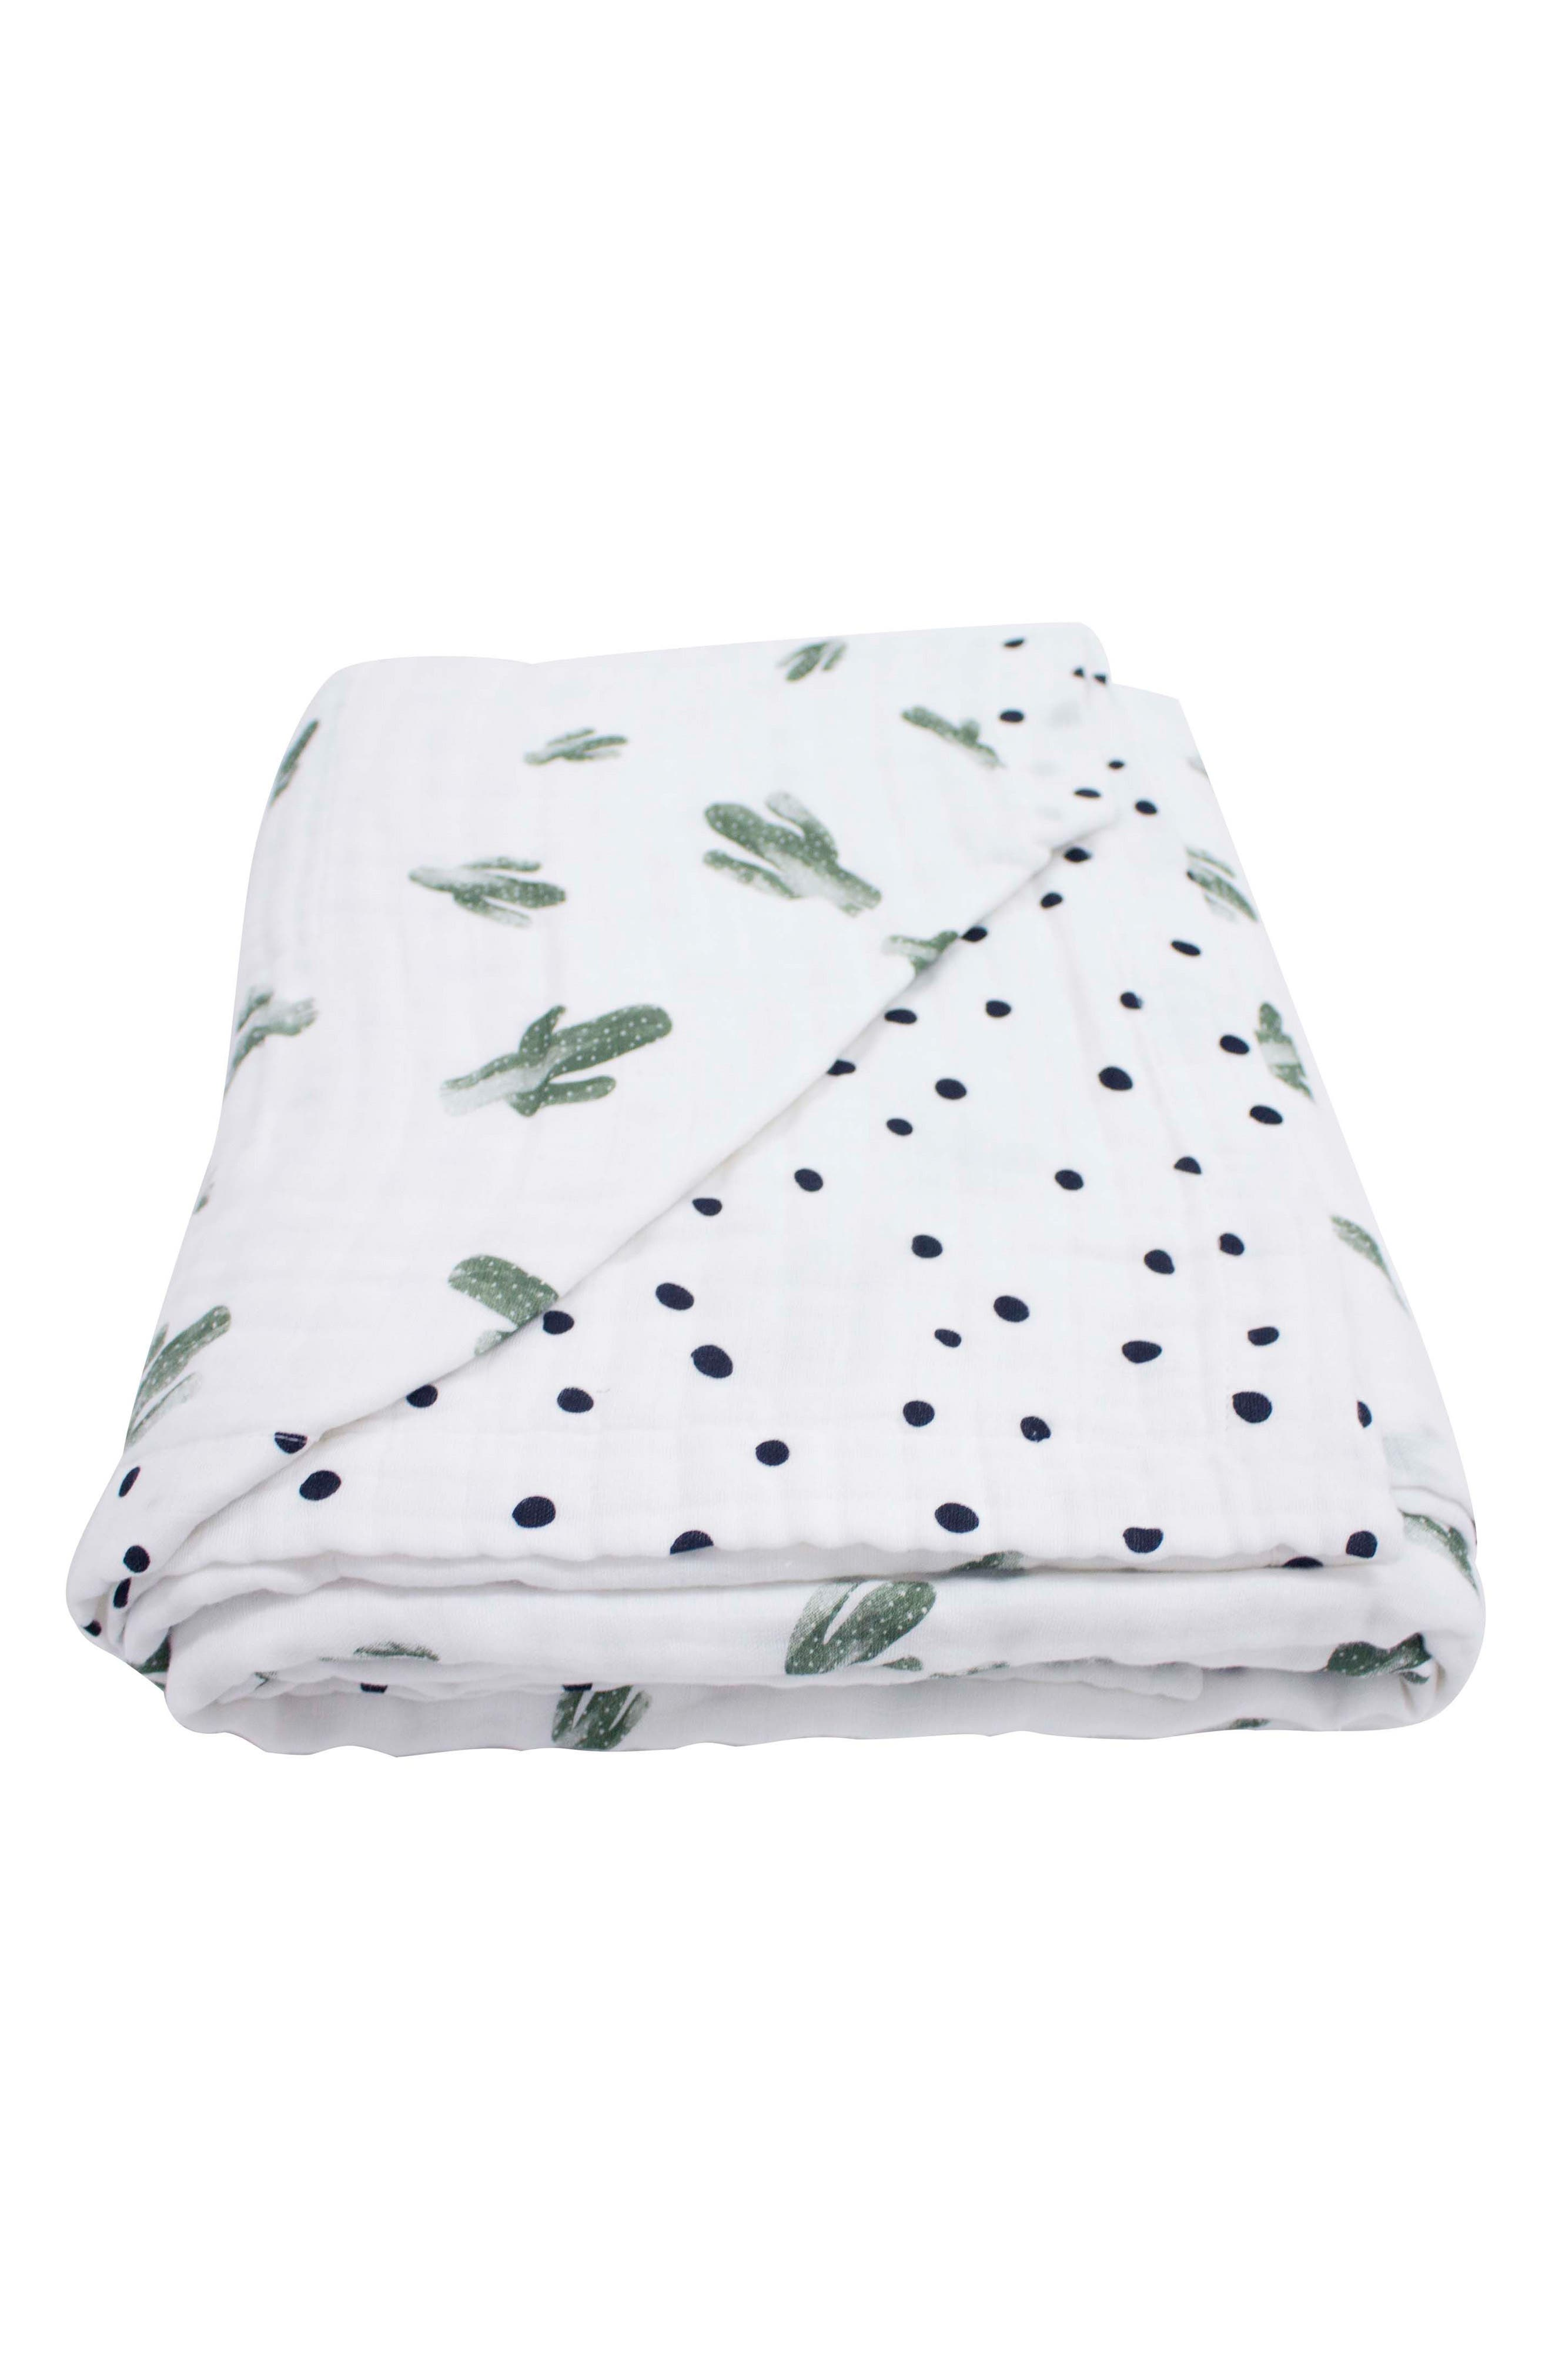 Oh So Soft Super Snuggle Blanket,                             Main thumbnail 1, color,                             Saguaro/ Dottie